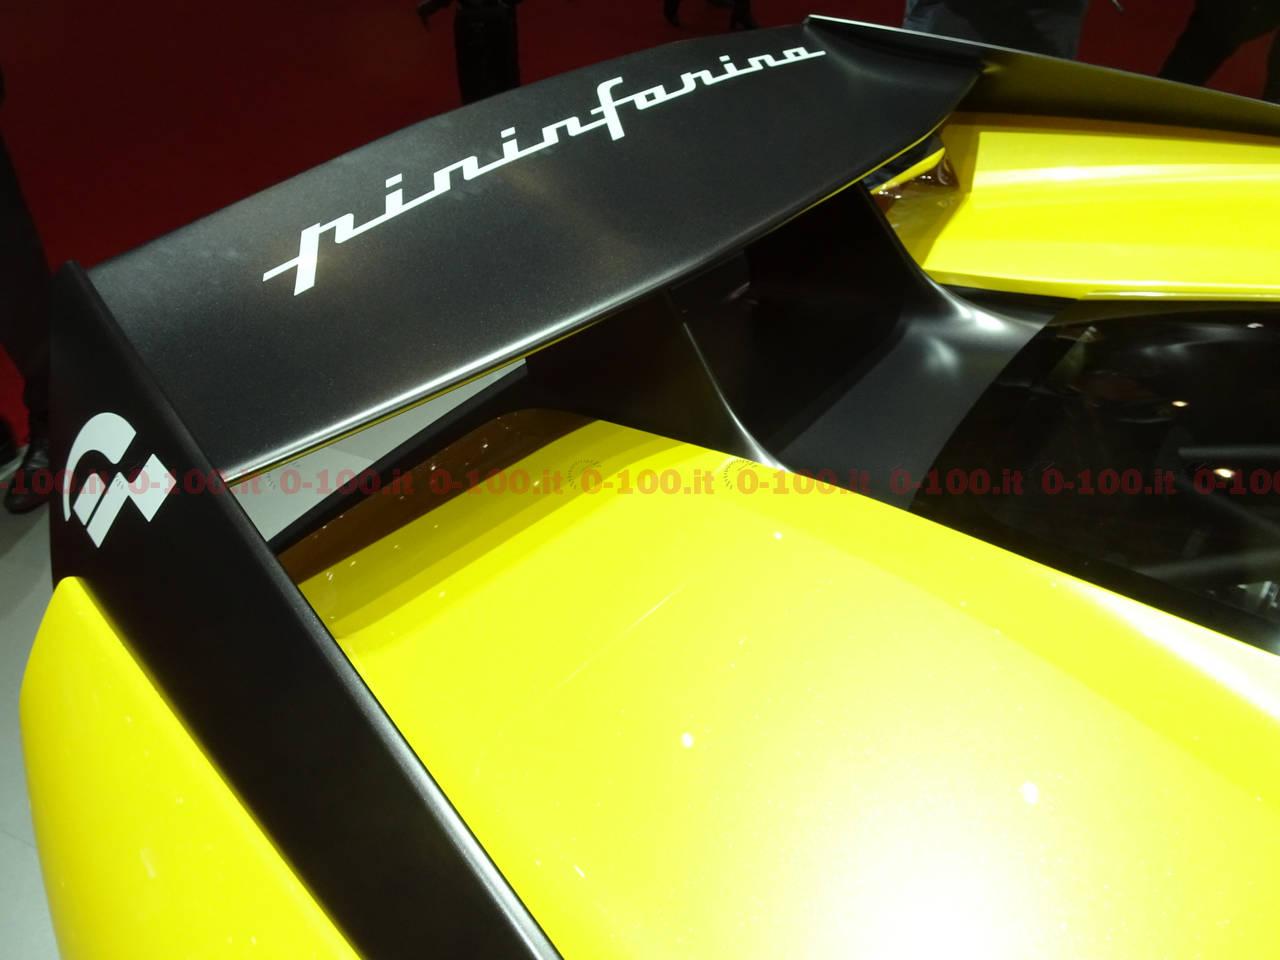 geneva-geneve-ginevra-2017-auto-show-pininfarina_fittipaldi-ef7-vision-gran-turismo-sony-playstation_0-100_3